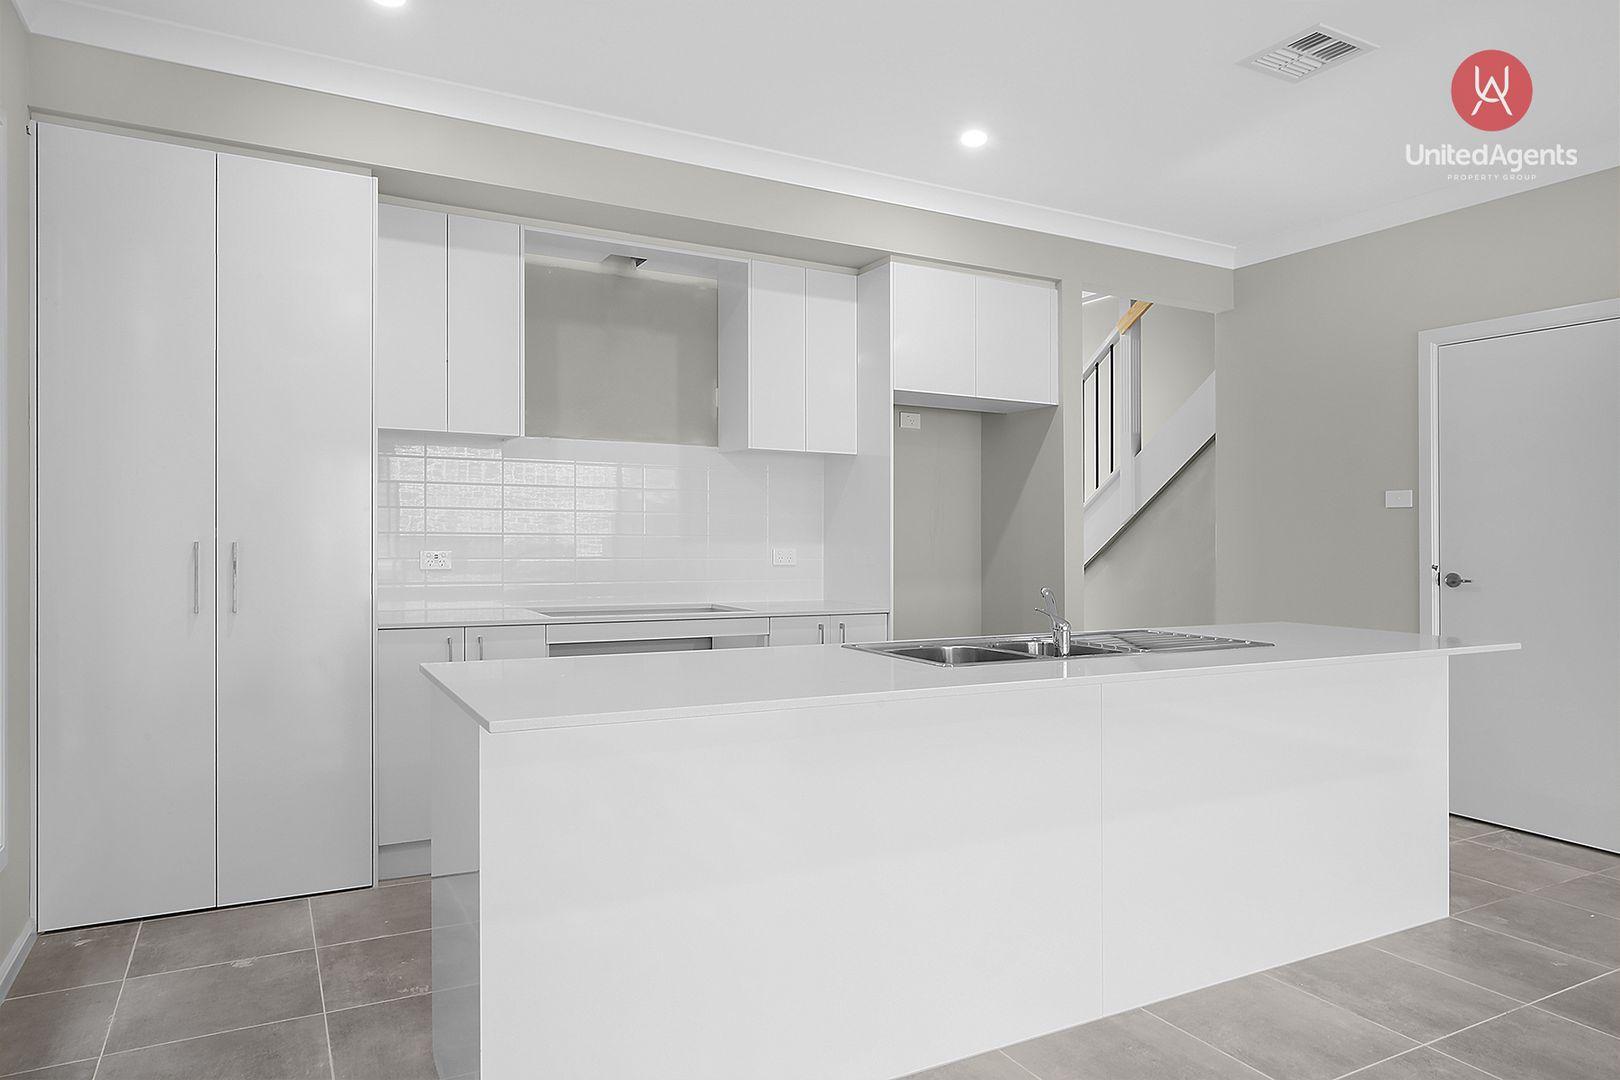 40/Lot 59 Connemara Street, Austral NSW 2179, Image 1